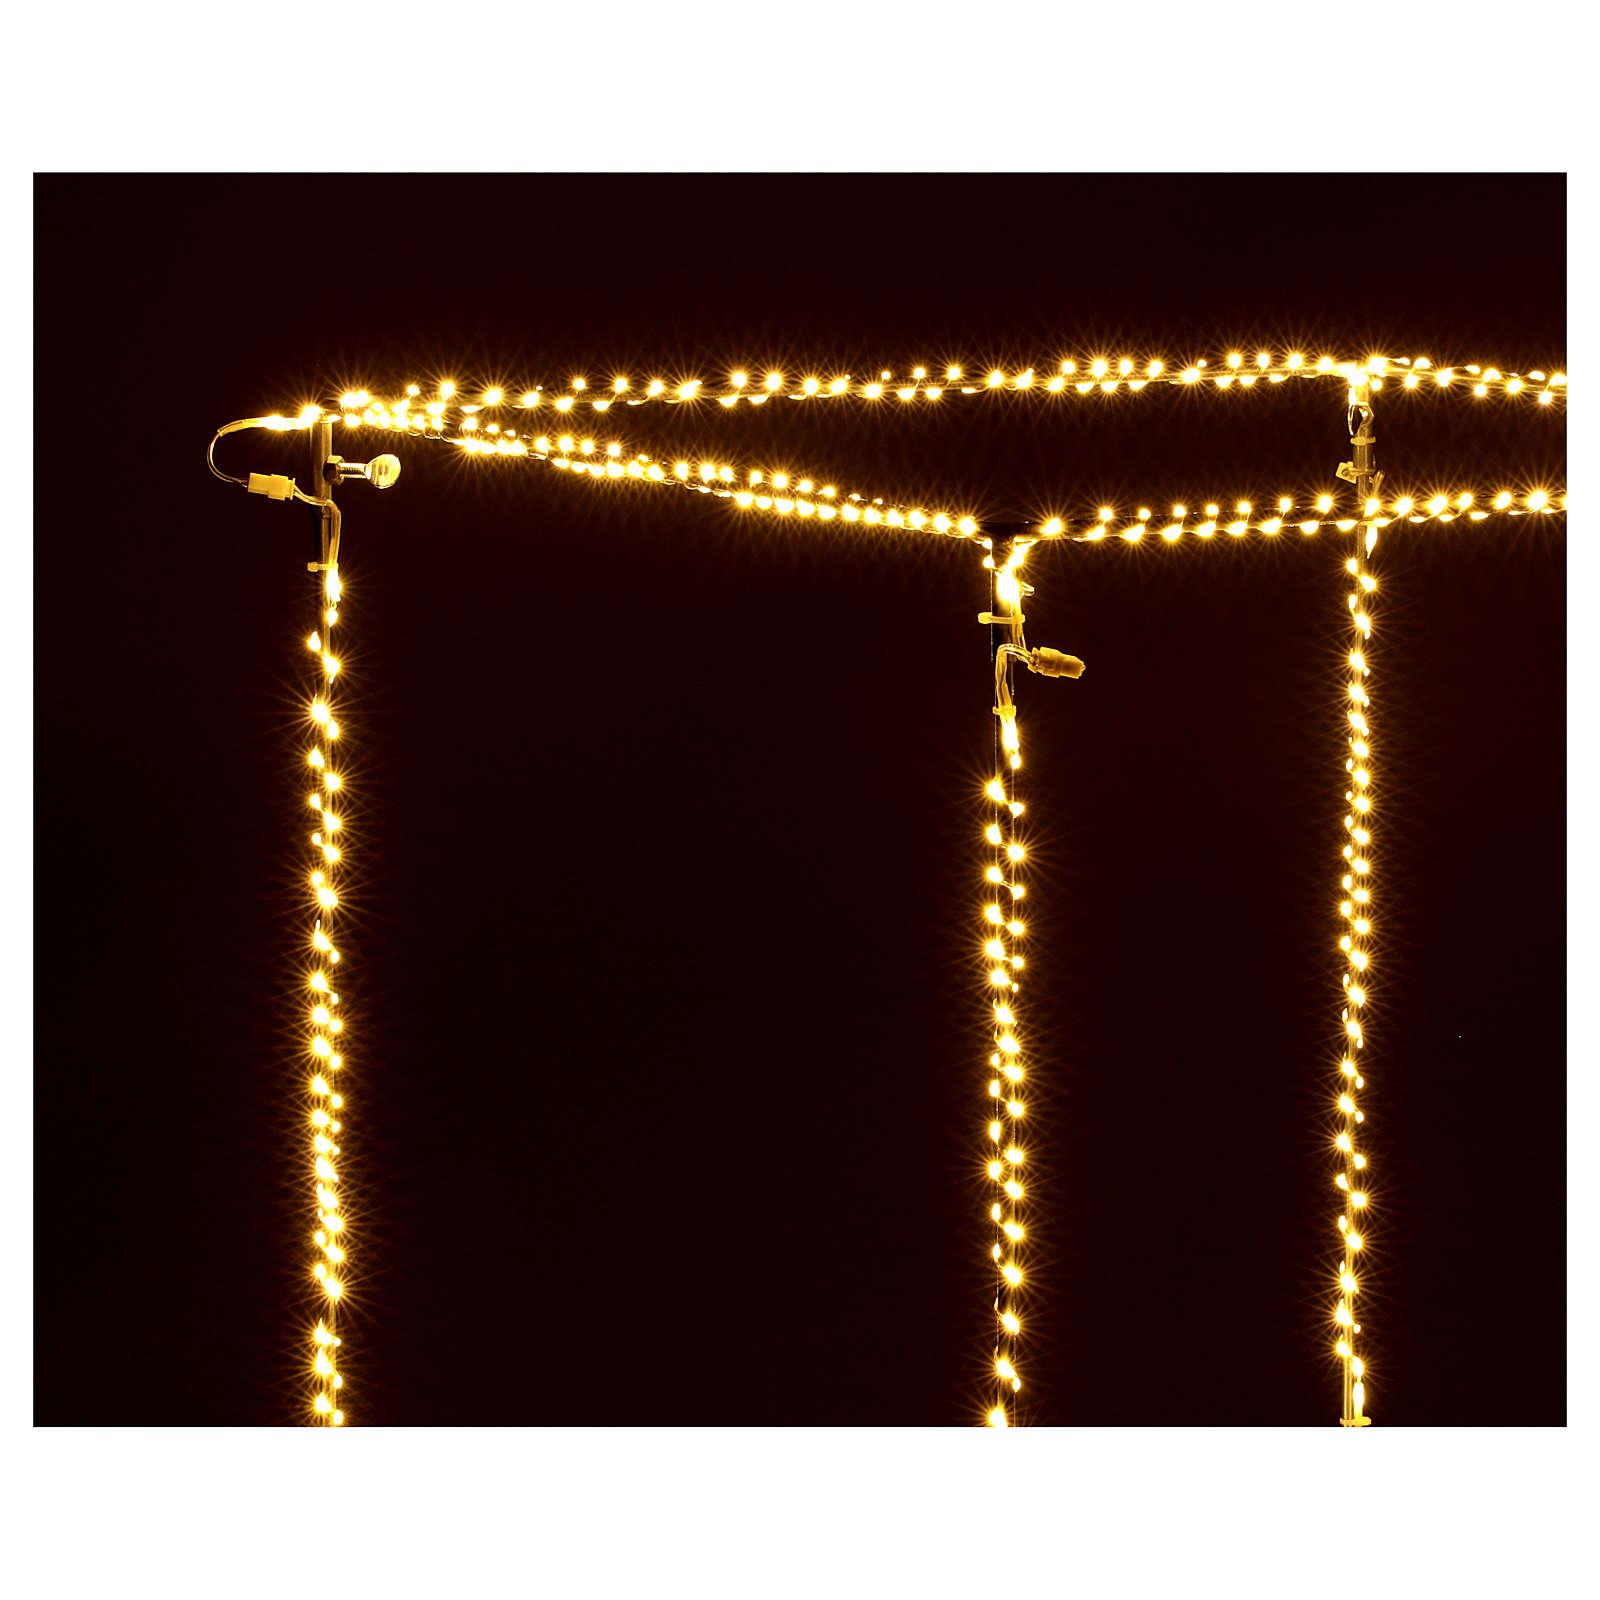 Cubo luminoso navideño 50 cm con 740 led blanco cálido interior corriente 3